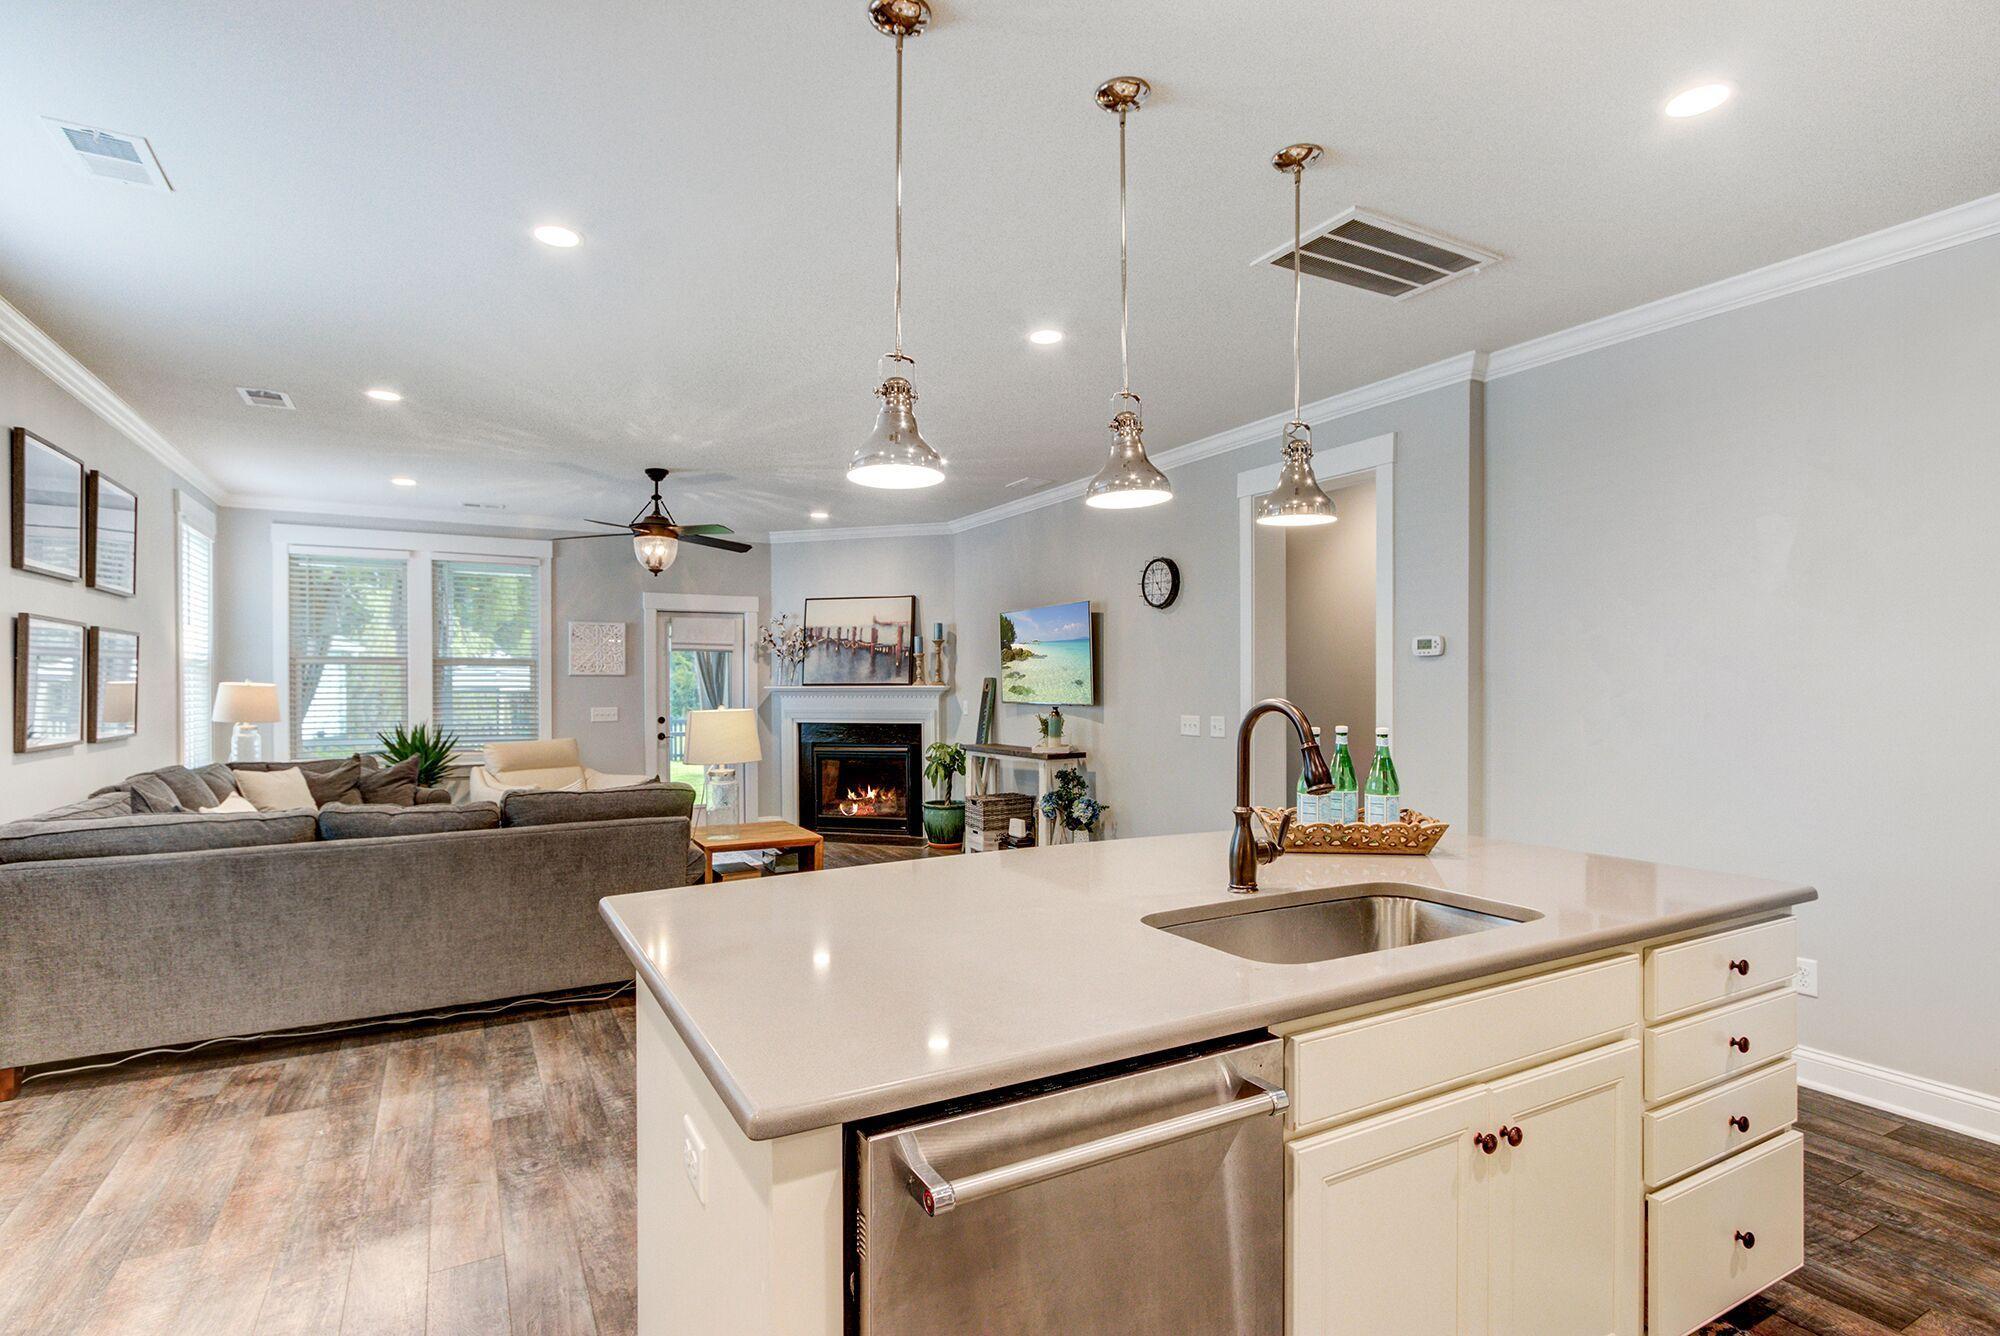 Carolina Bay Homes For Sale - 2739 Rutherford, Charleston, SC - 12